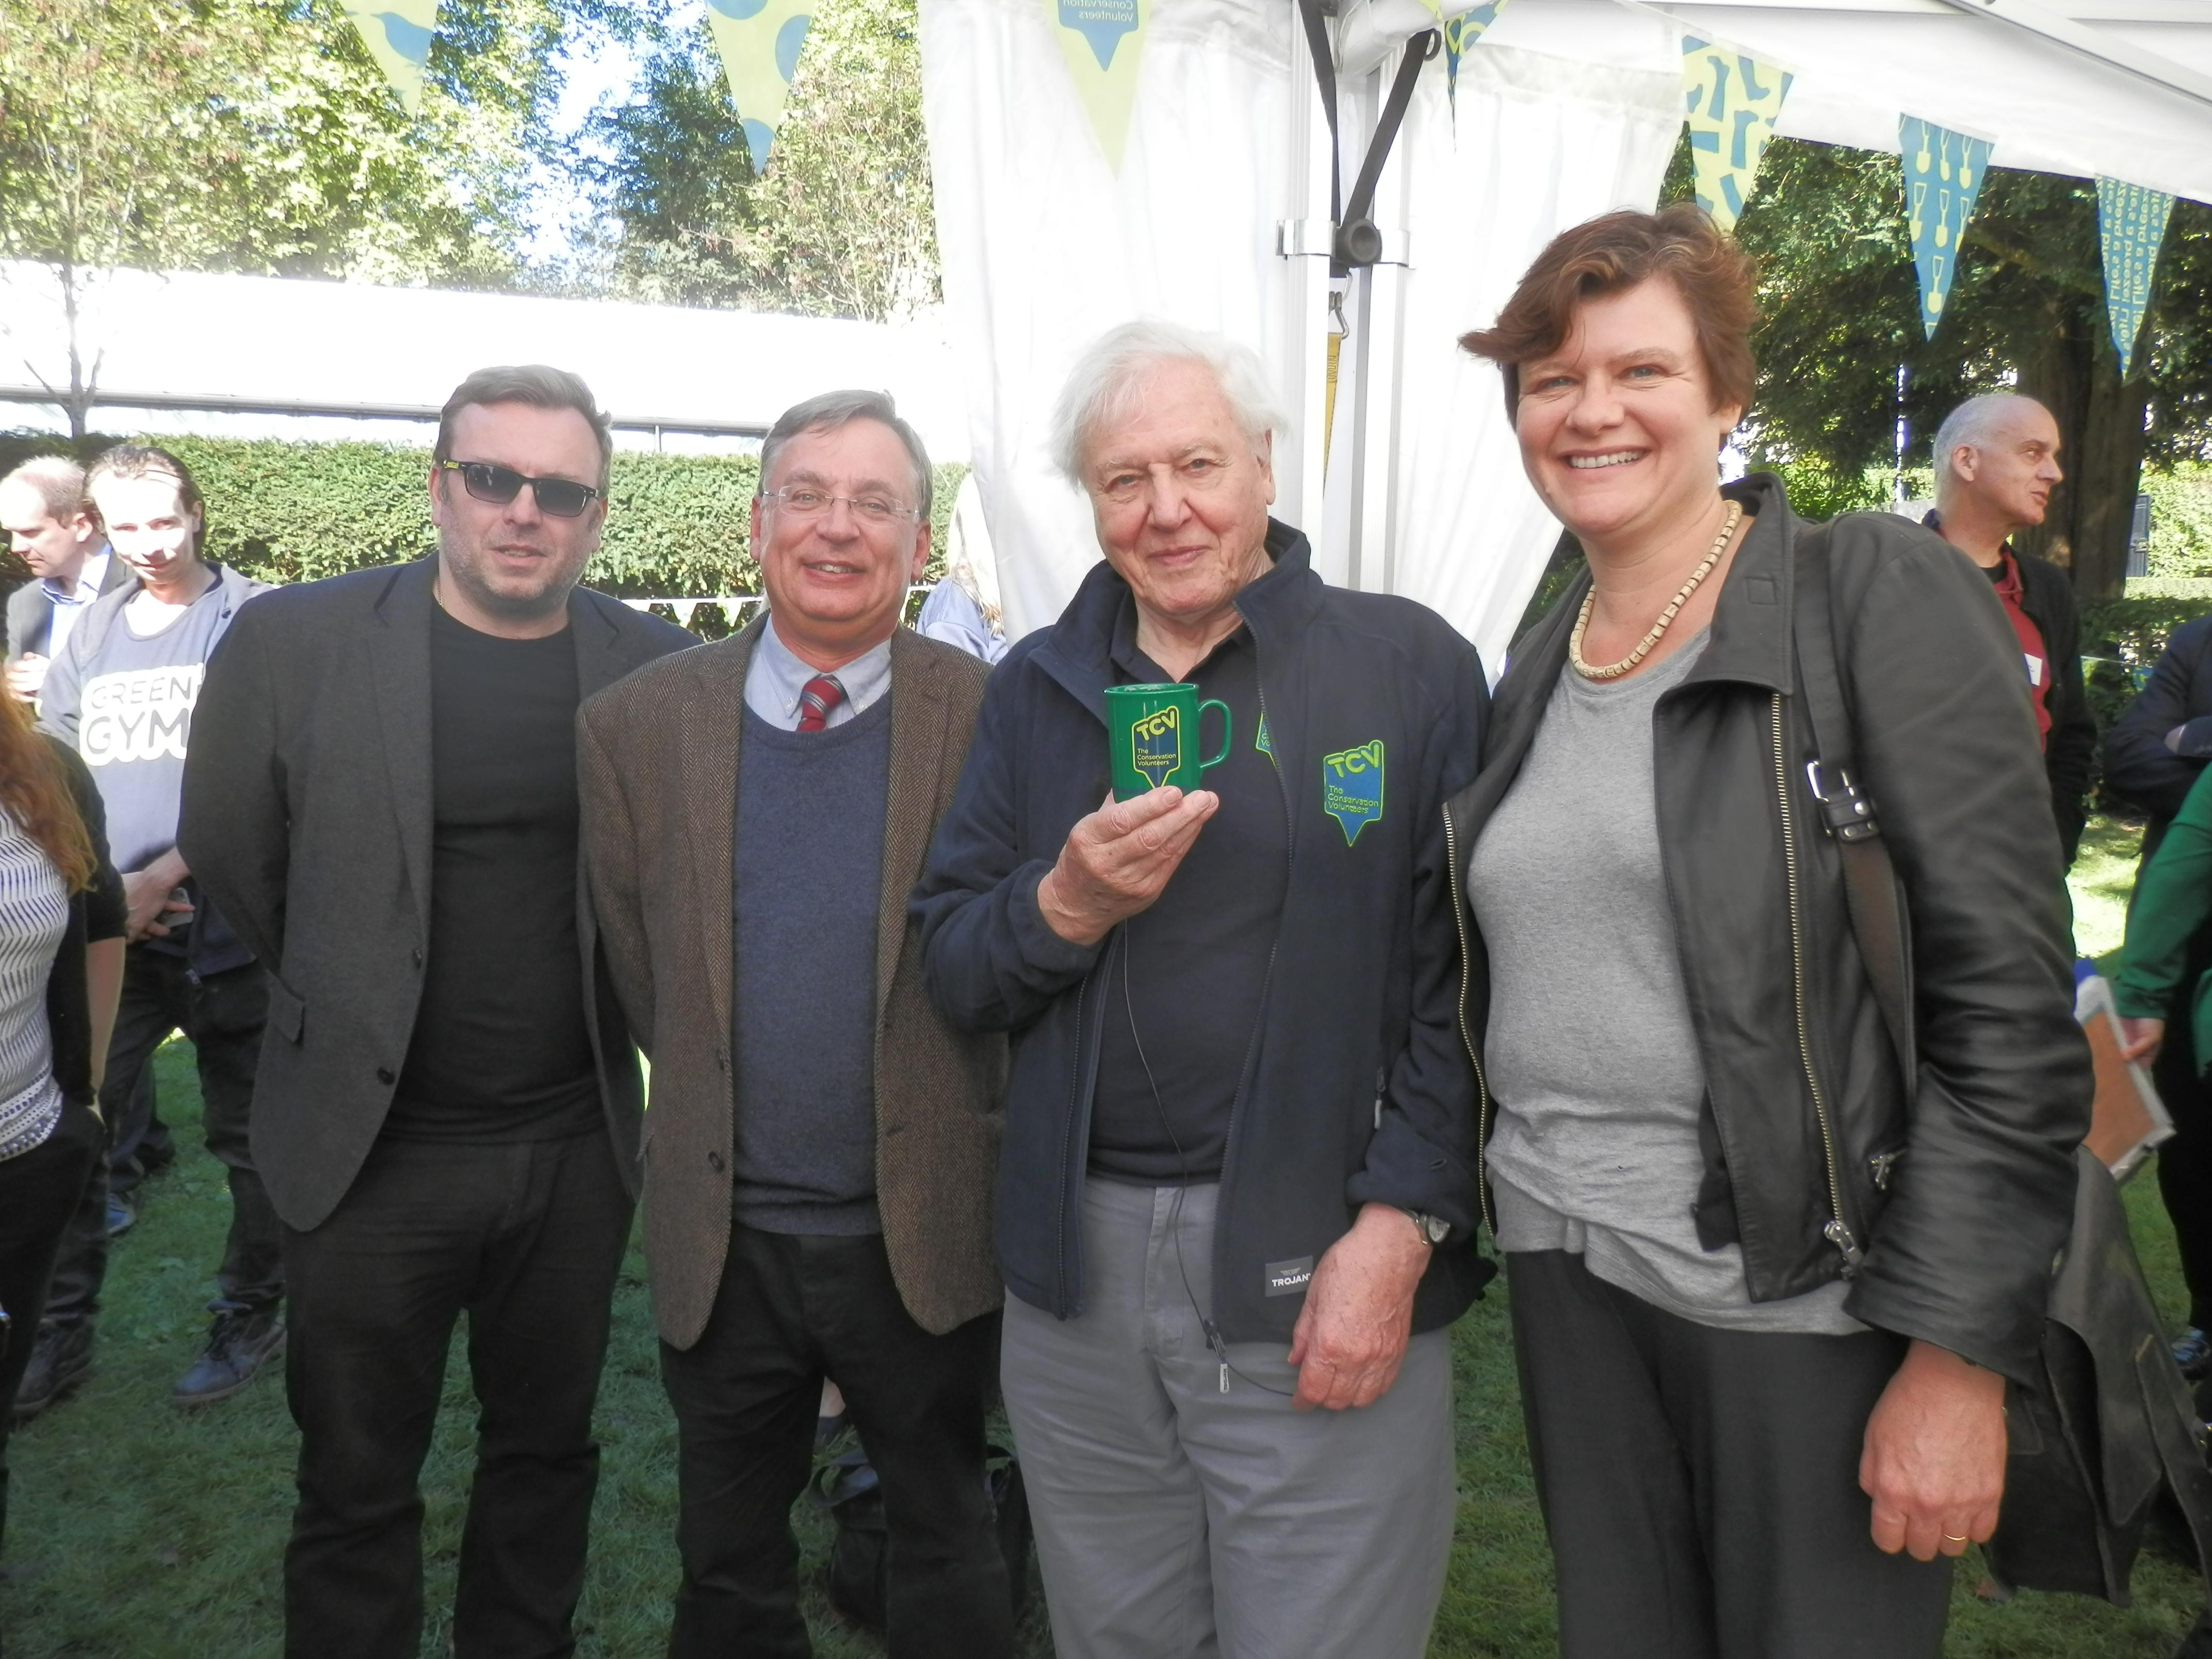 Andrew Dismore AM, Sir David Attenborough, Cllr Sally Gimson